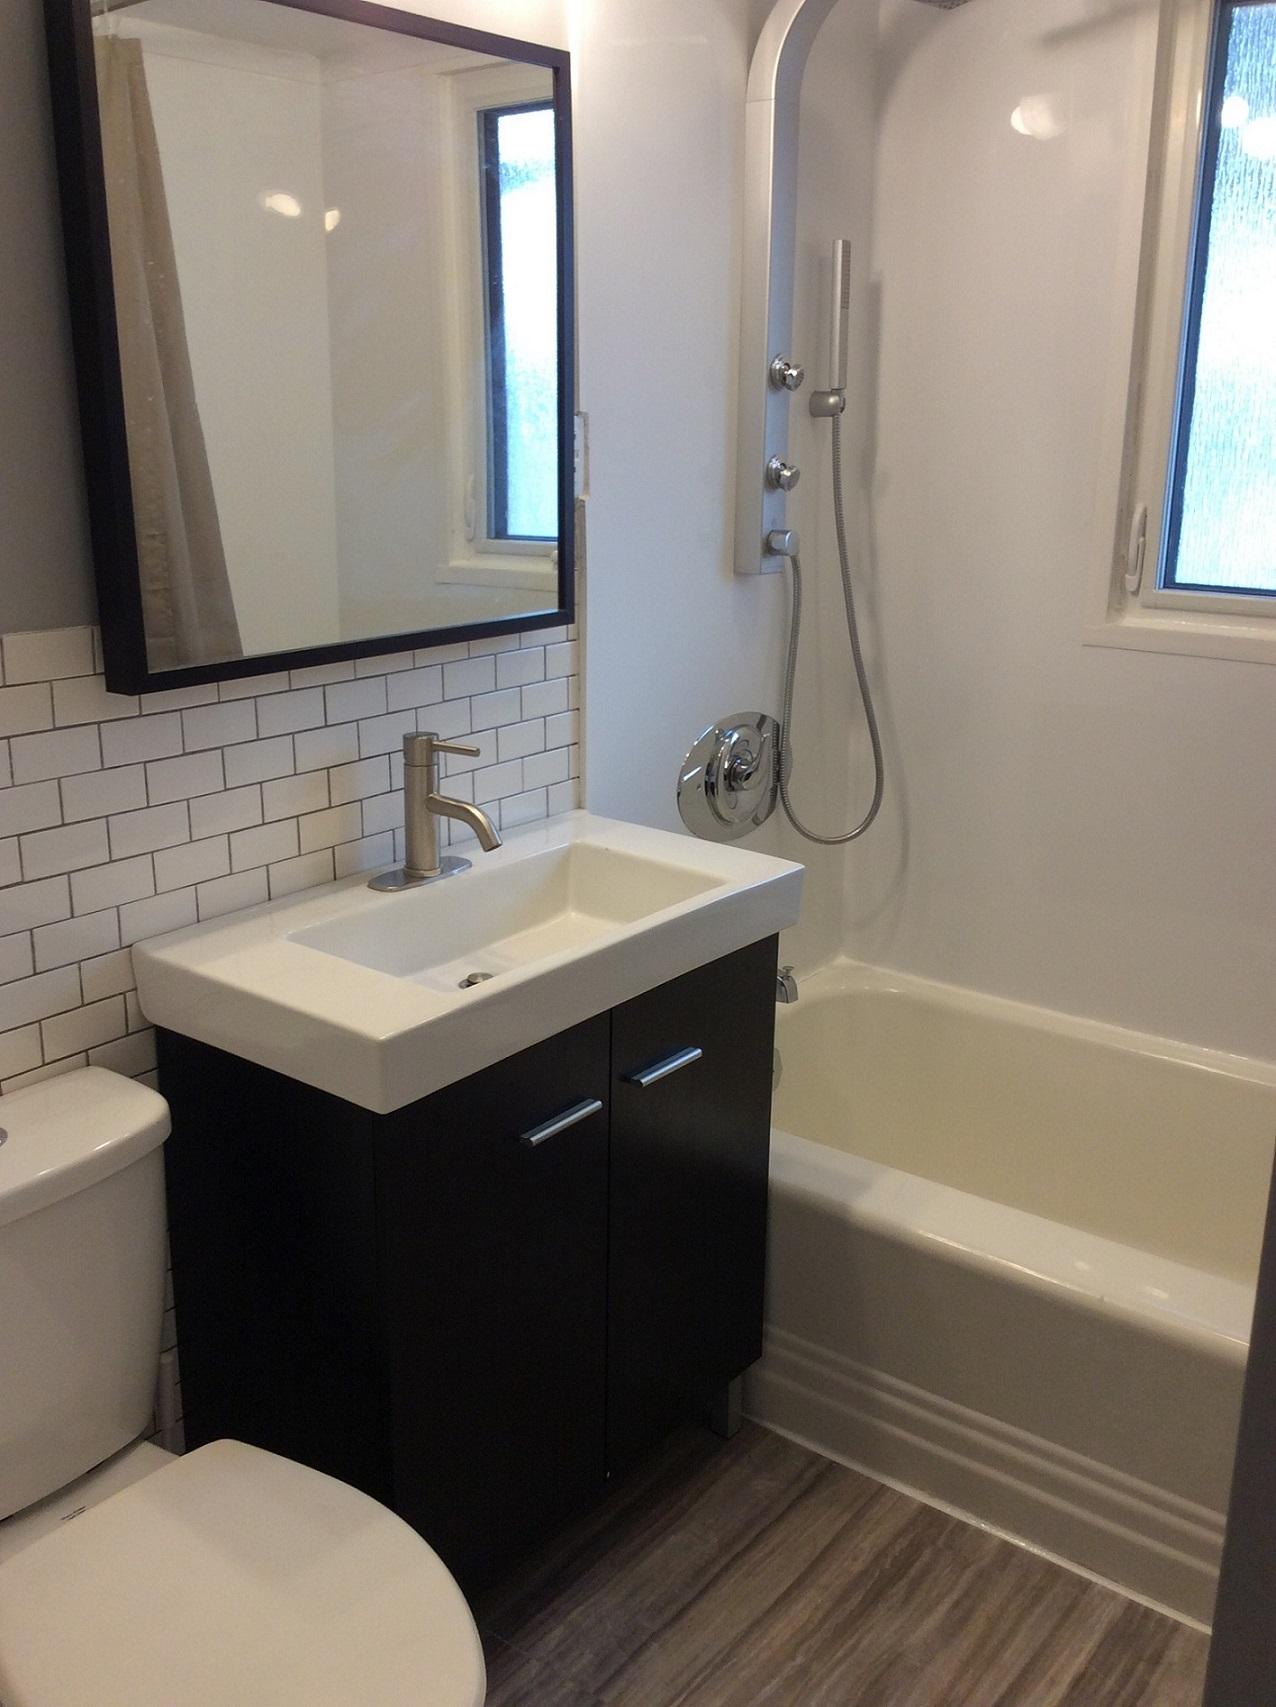 1045 Bannerman Ave.,Winnipeg,Manitoba,2 Bedrooms Bedrooms,1 BathroomBathrooms,Duplex,Bannerman Ave.,1111